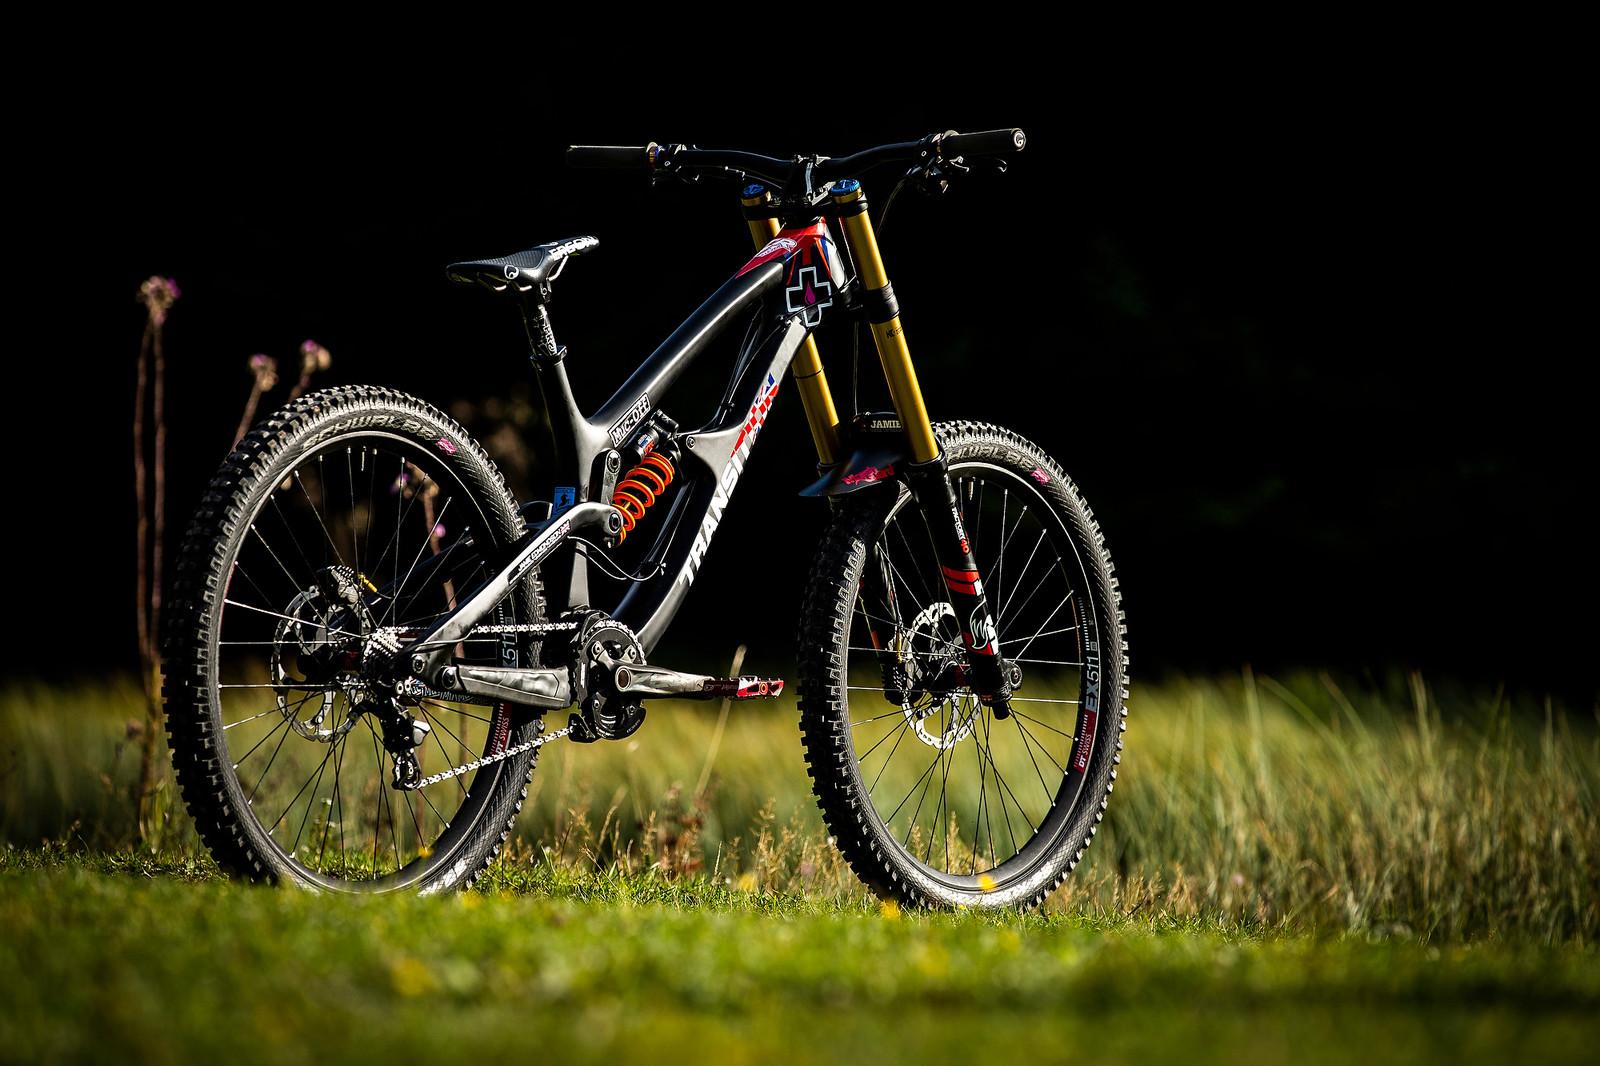 Jamie Edmondson's Transition TR11 World Champs Bike - WORLD CHAMPS BIKE - Jamie Edmondson's Transition TR11 - Mountain Biking Pictures - Vital MTB